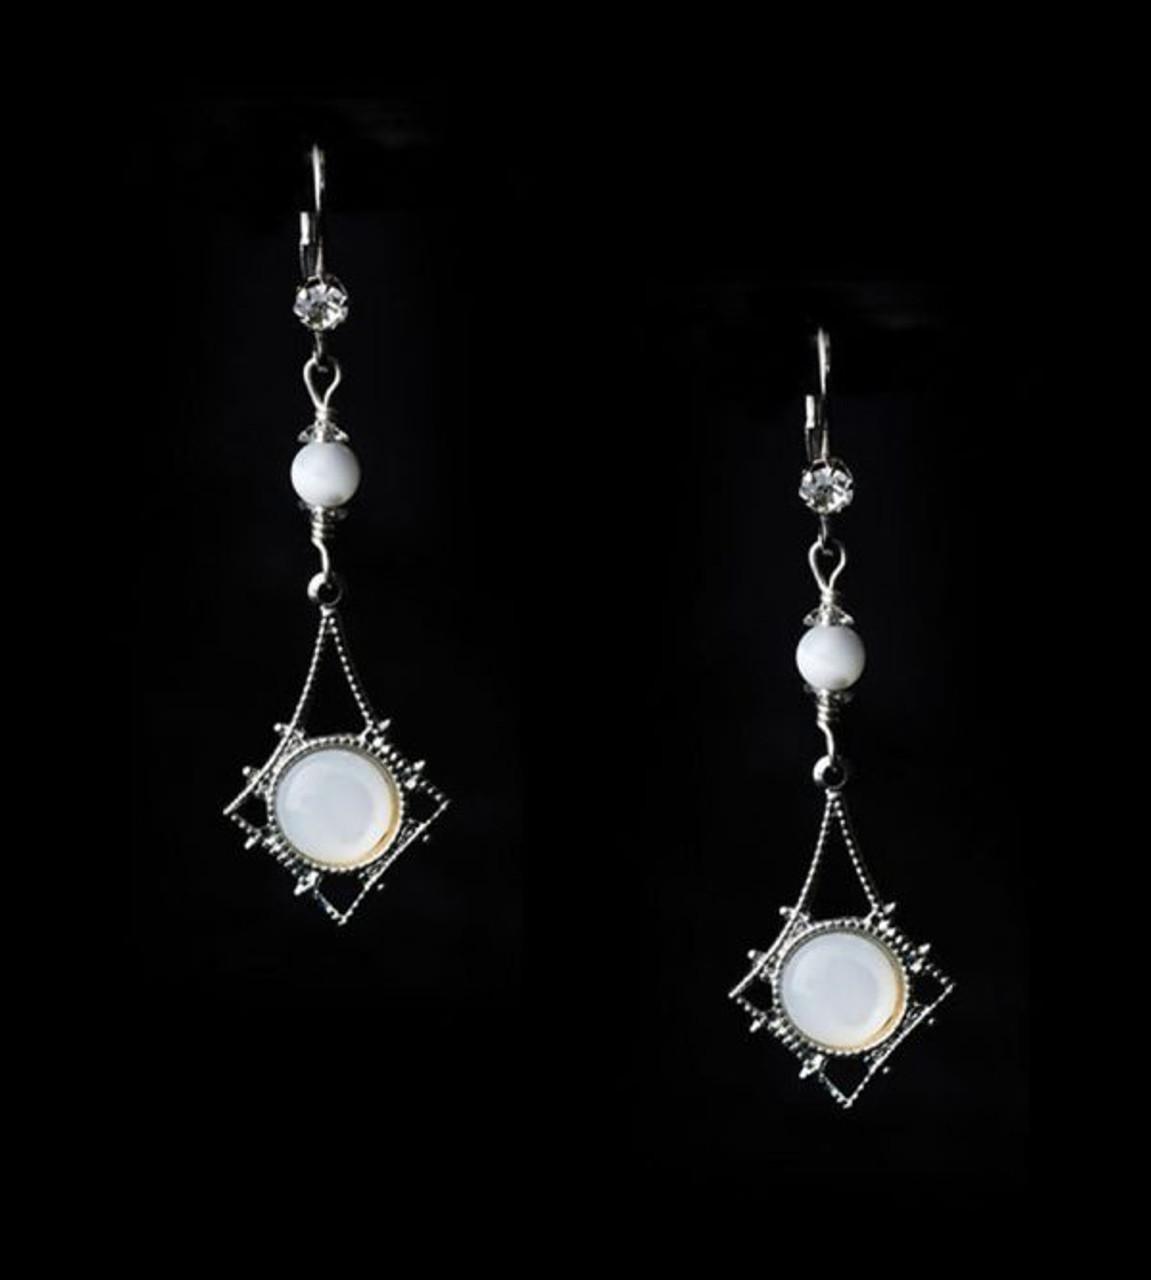 Erica Koesler Earring - Style J-9468